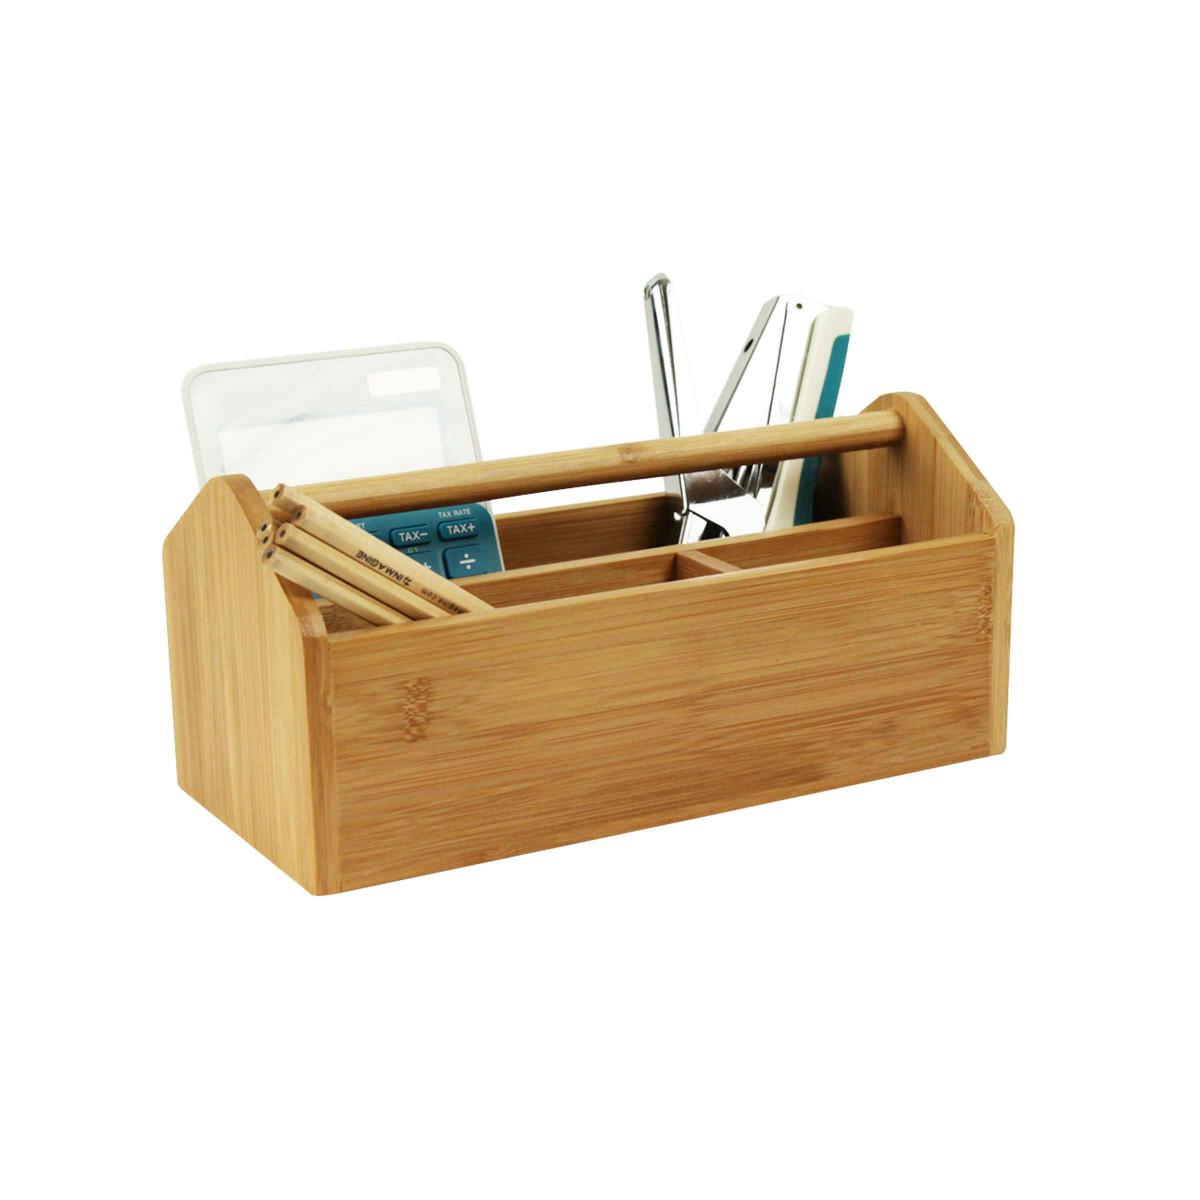 Organisateur de bureau en bois portable - Organisateur de bureau ...